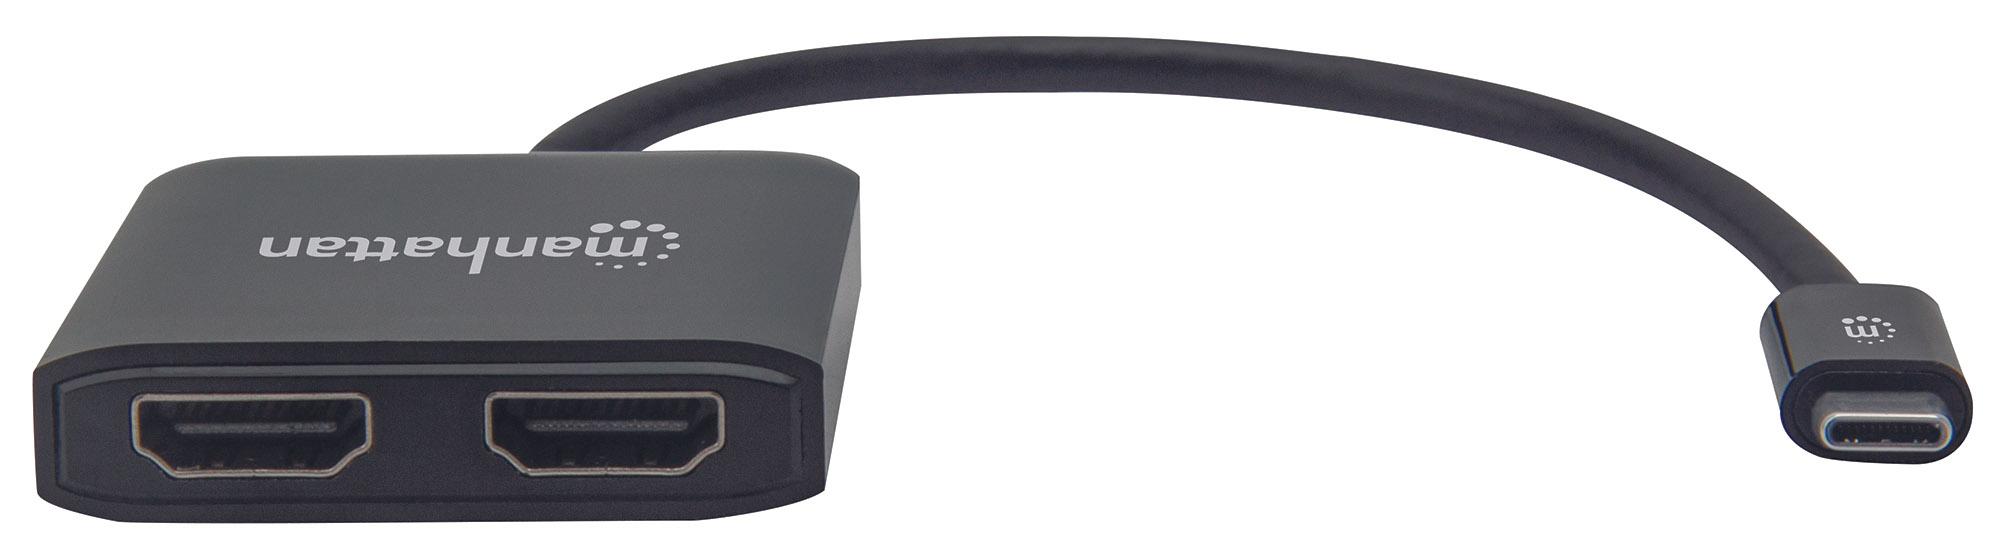 USB-C to Dual HDMI Converter - MST Hub